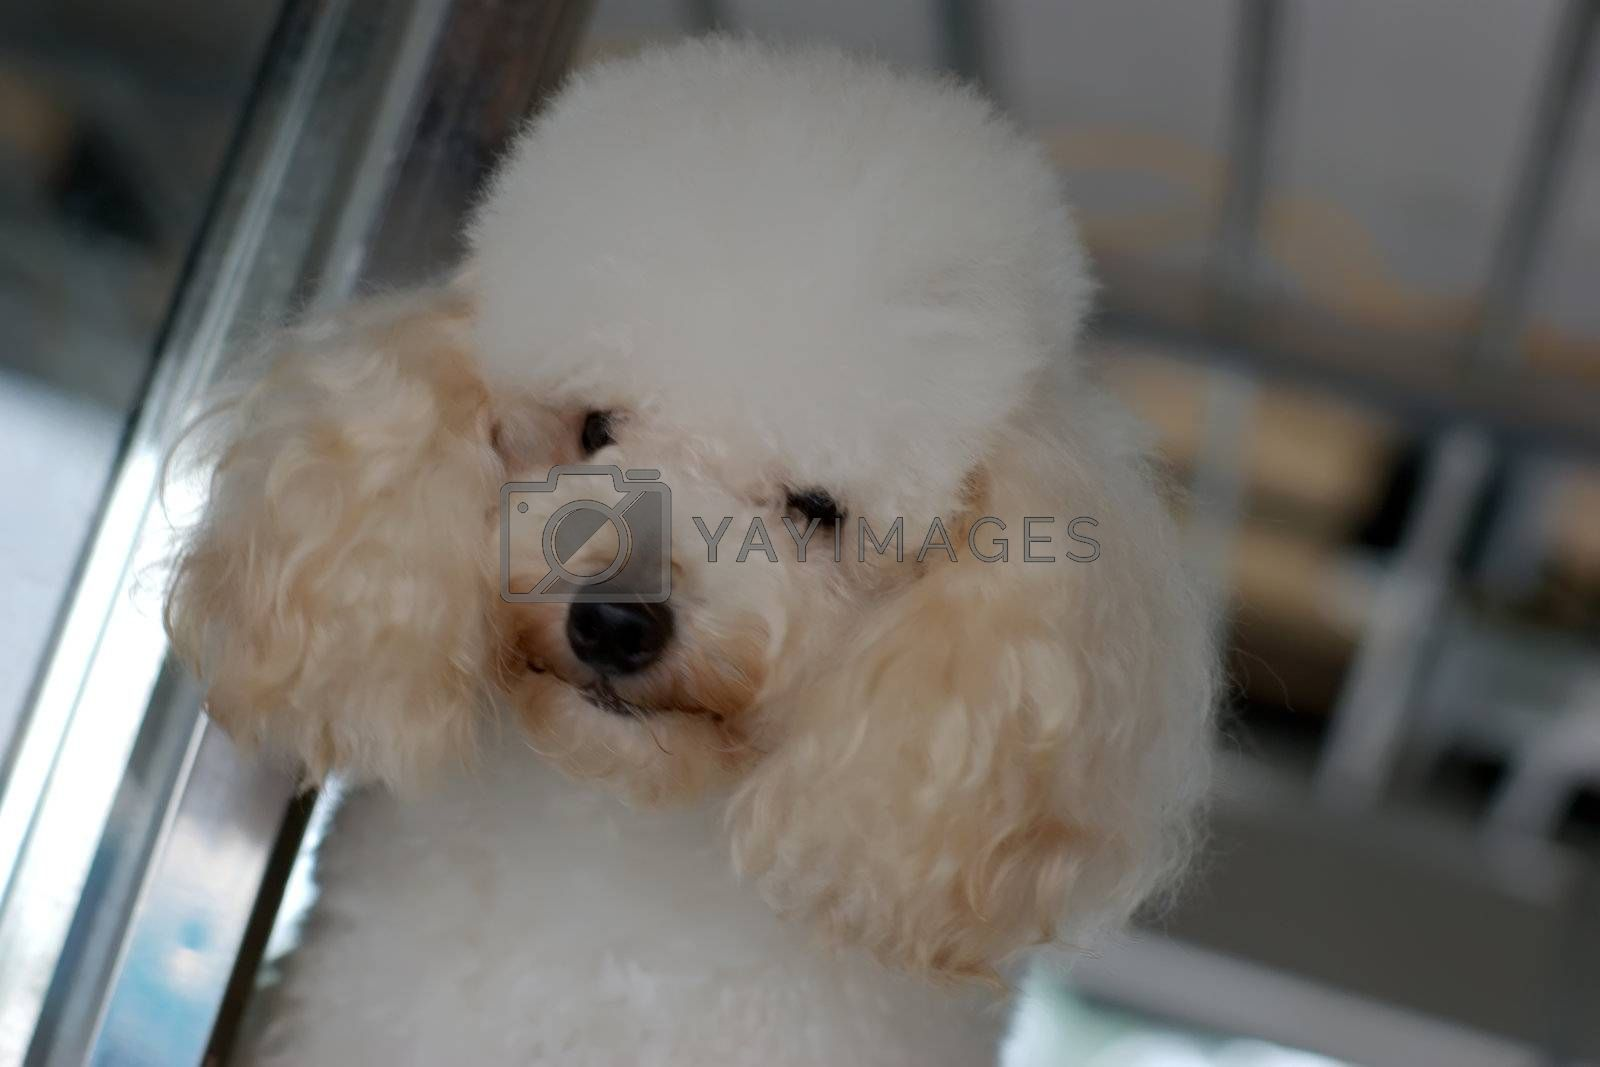 Royalty free image of dog by tang9555